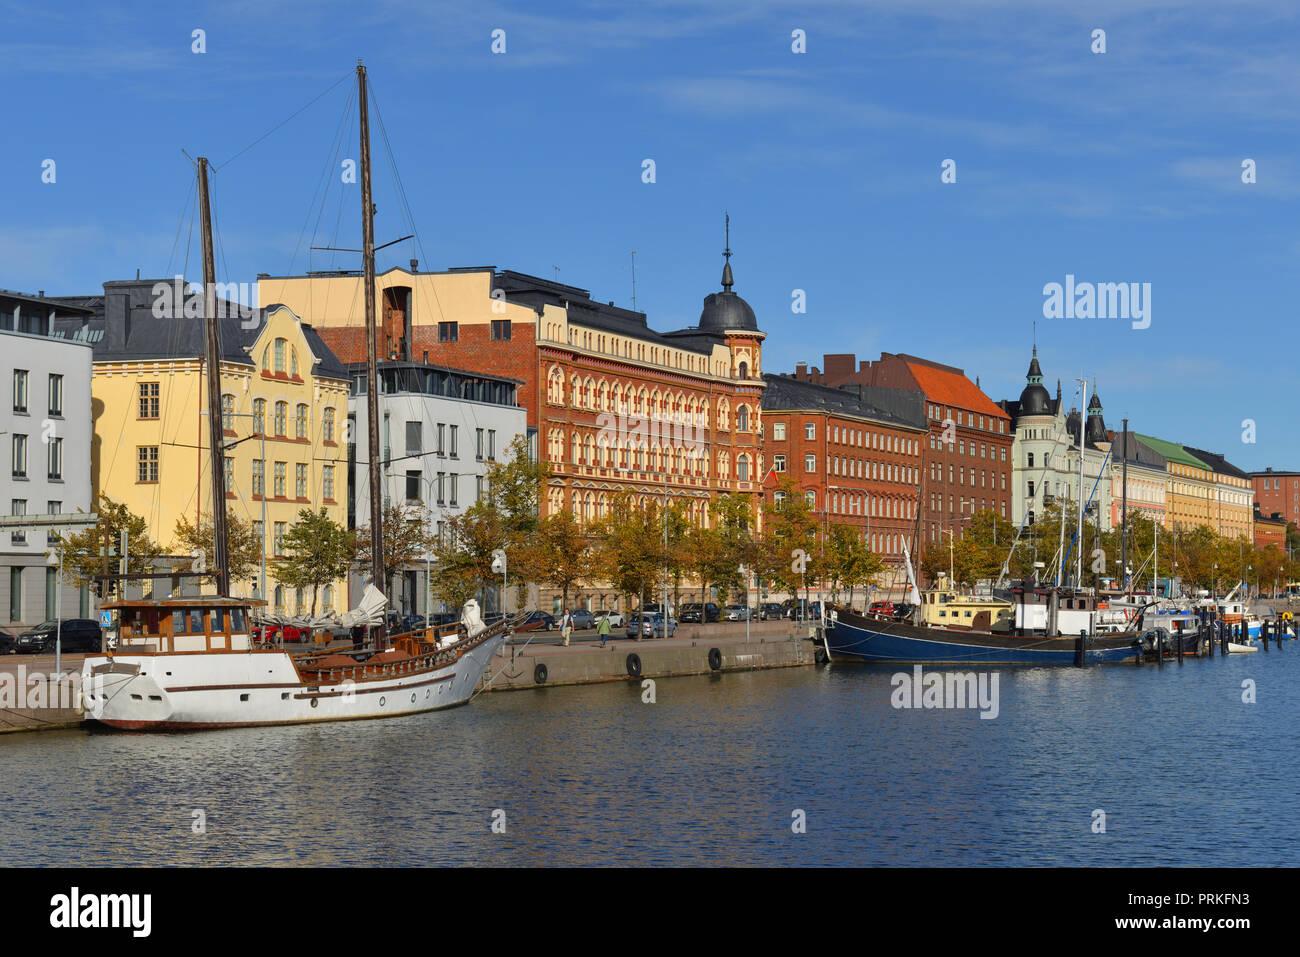 Pohjoisranta embankment and harbour. Katajanokka. Helsinki - Stock Image